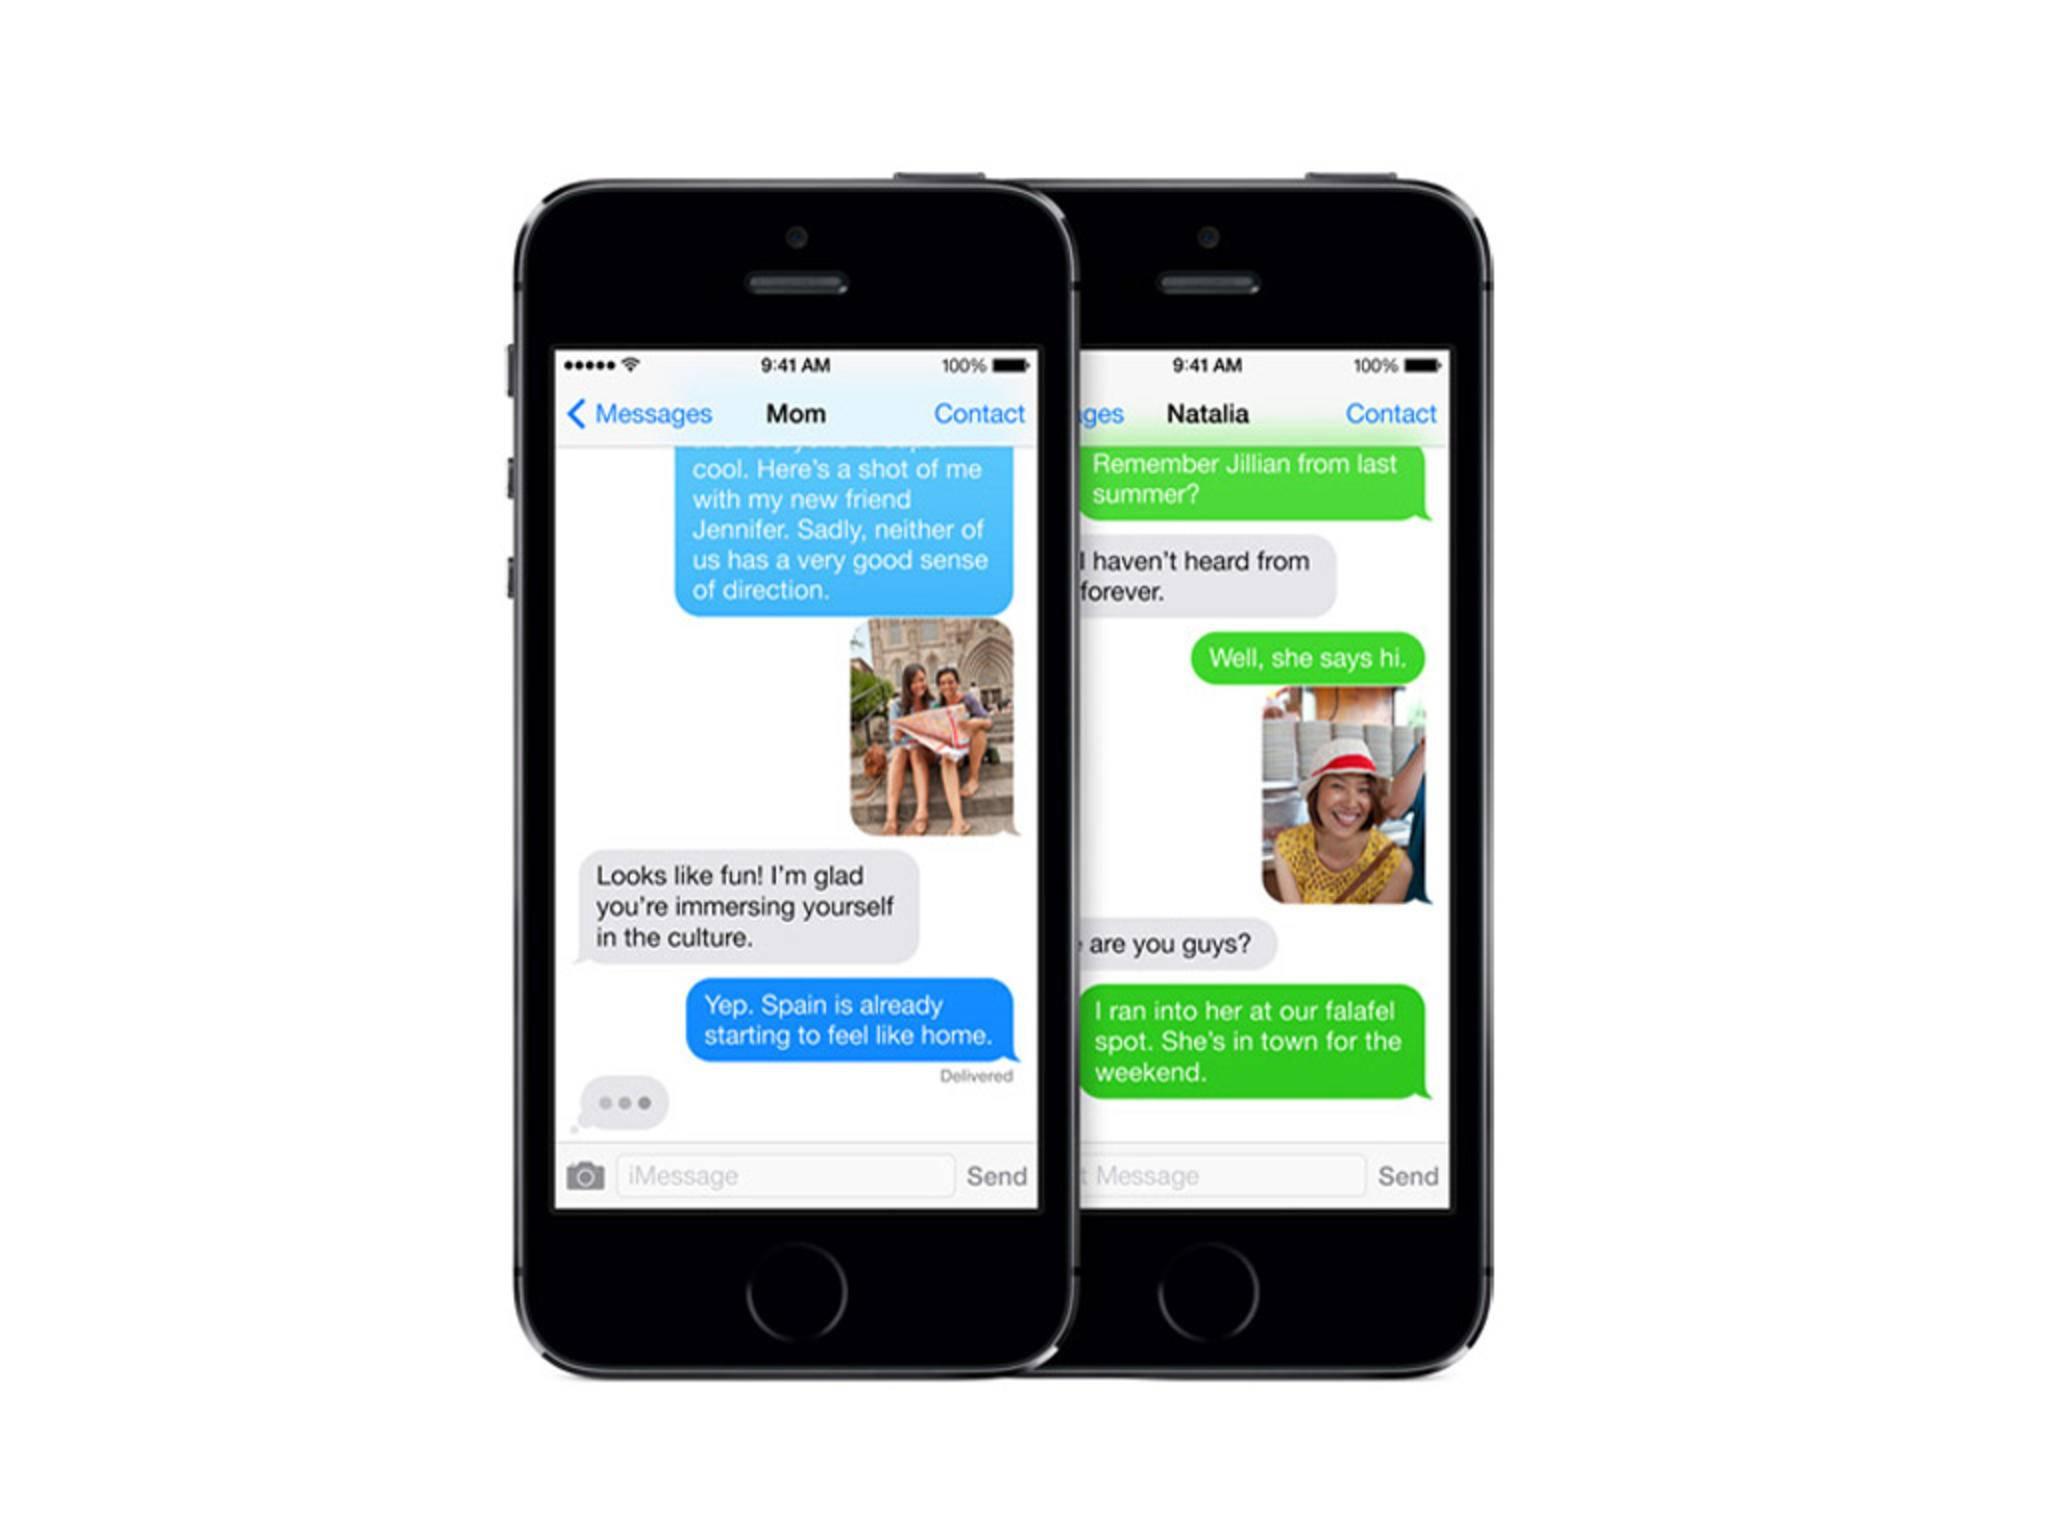 Apples iMessage erstrahlt in Blau, normale SMS hingegen in Grün.